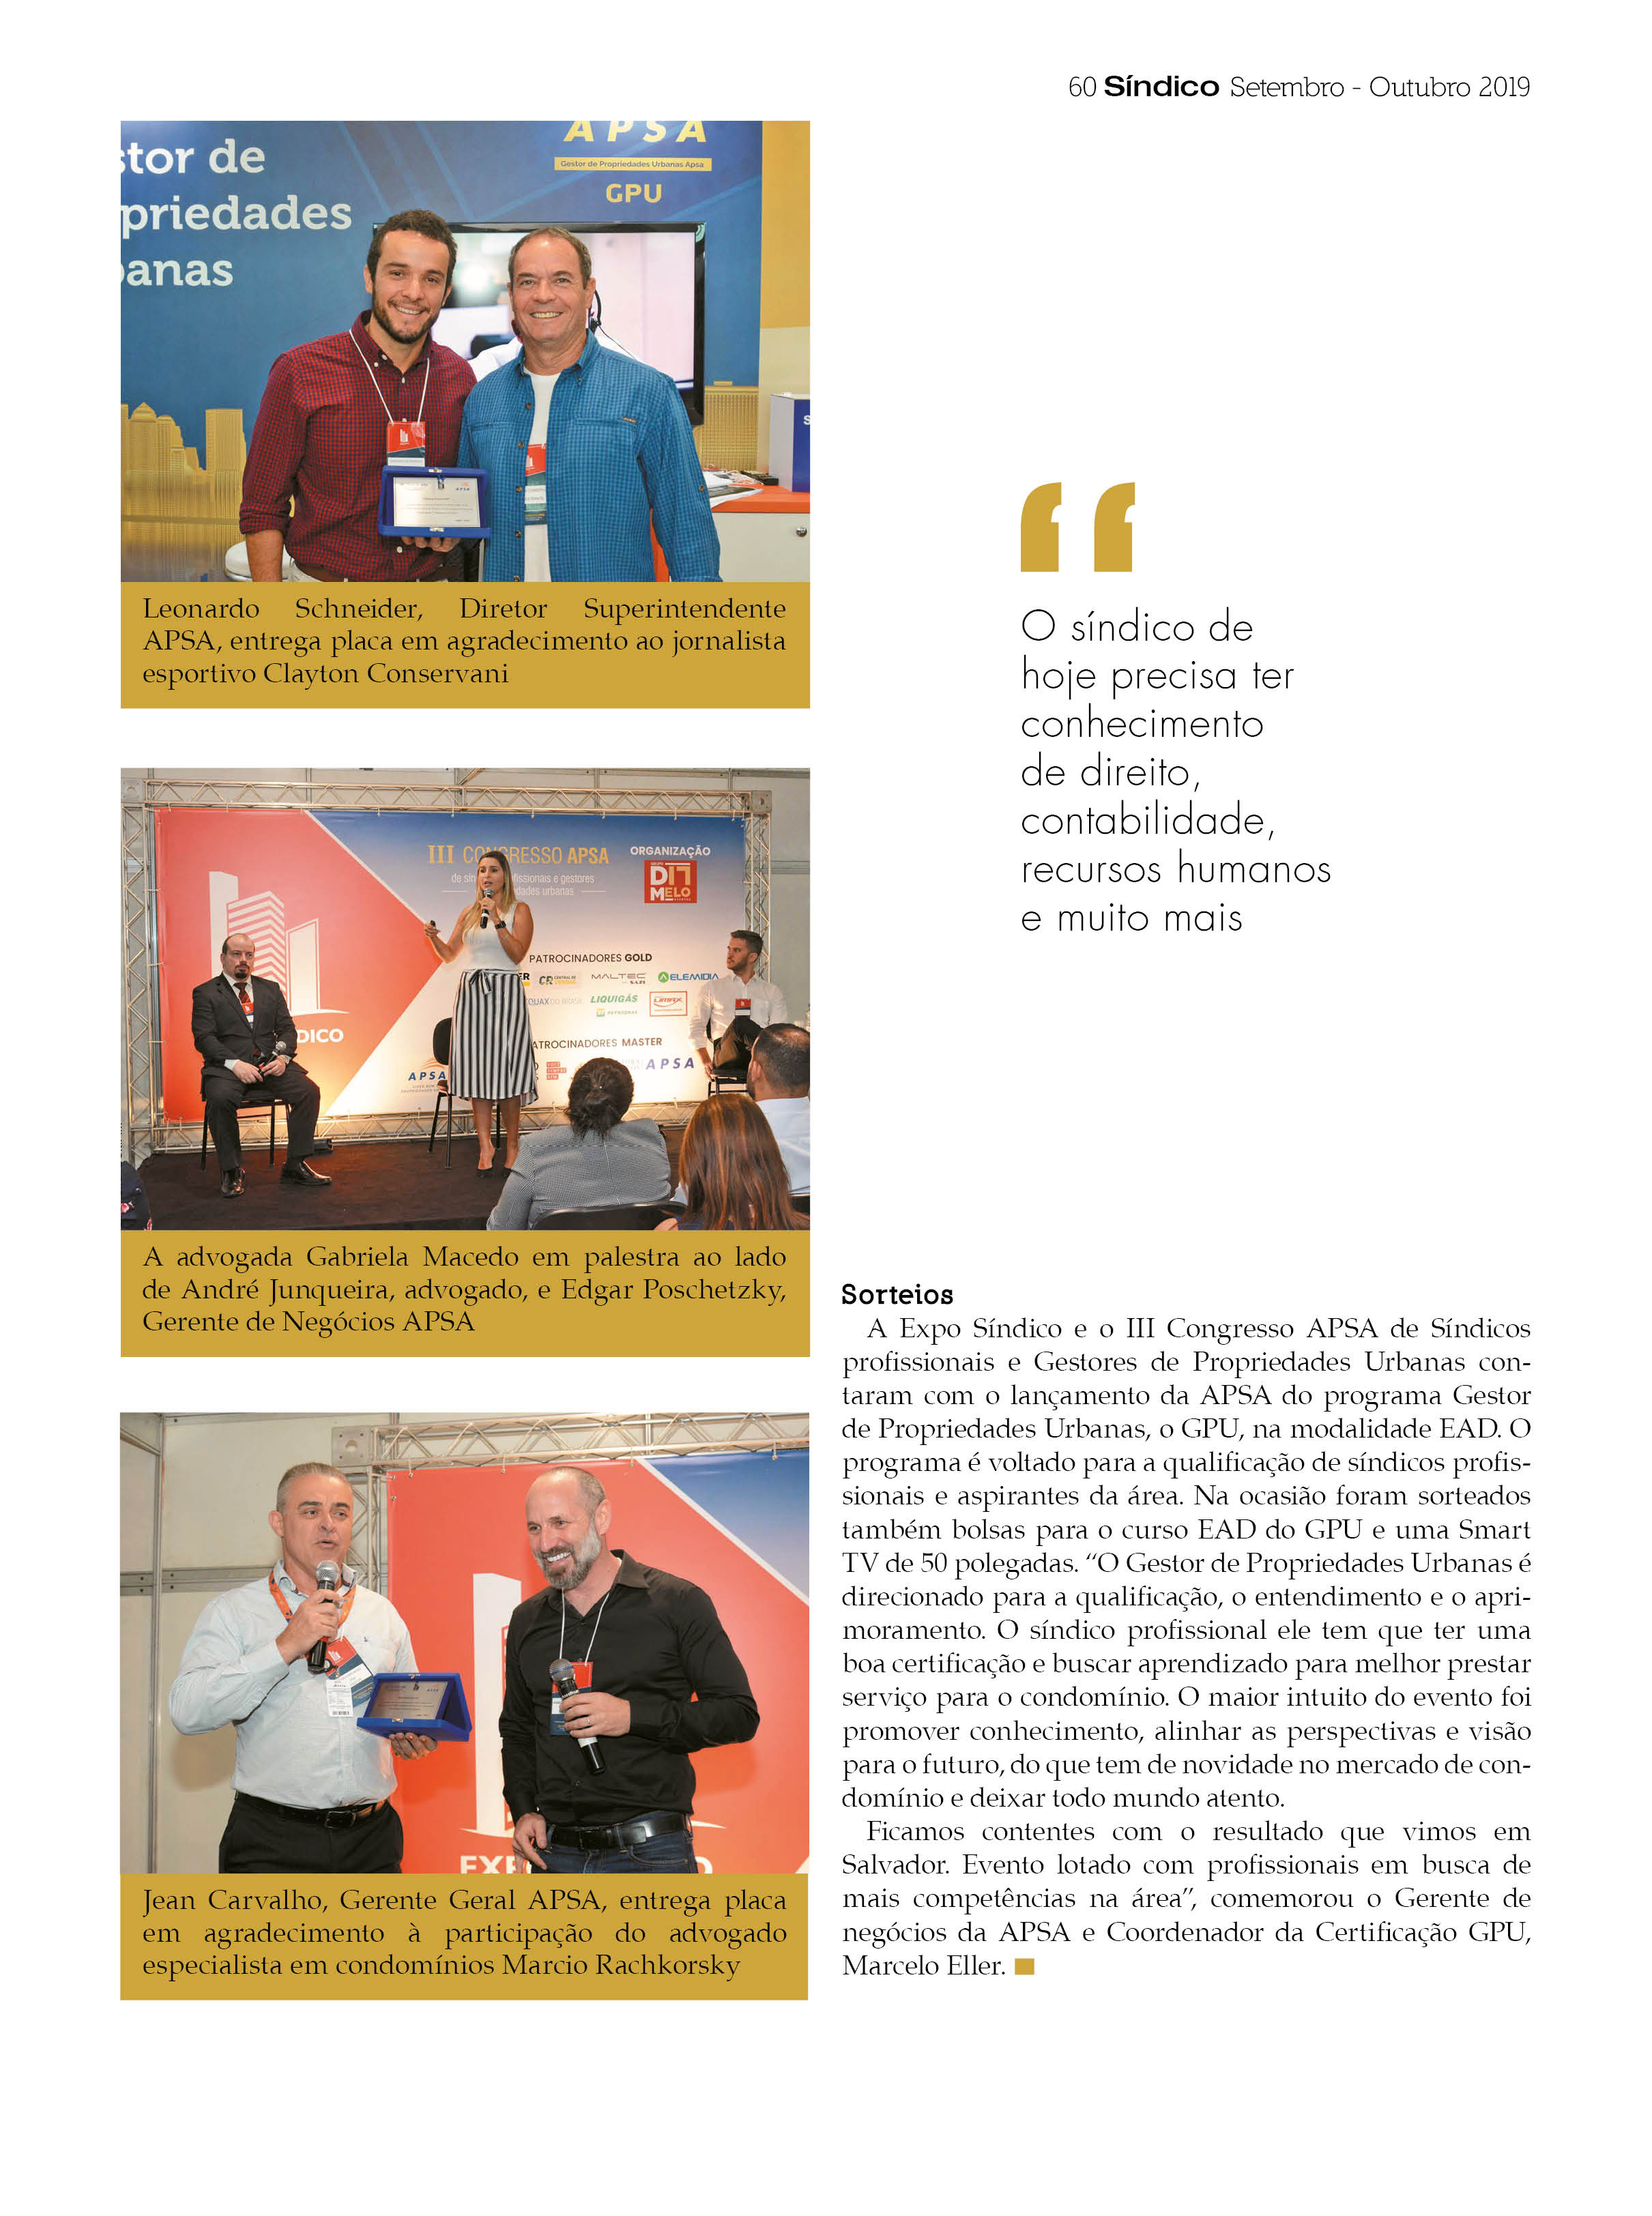 Revista Síndico_ed 246_58